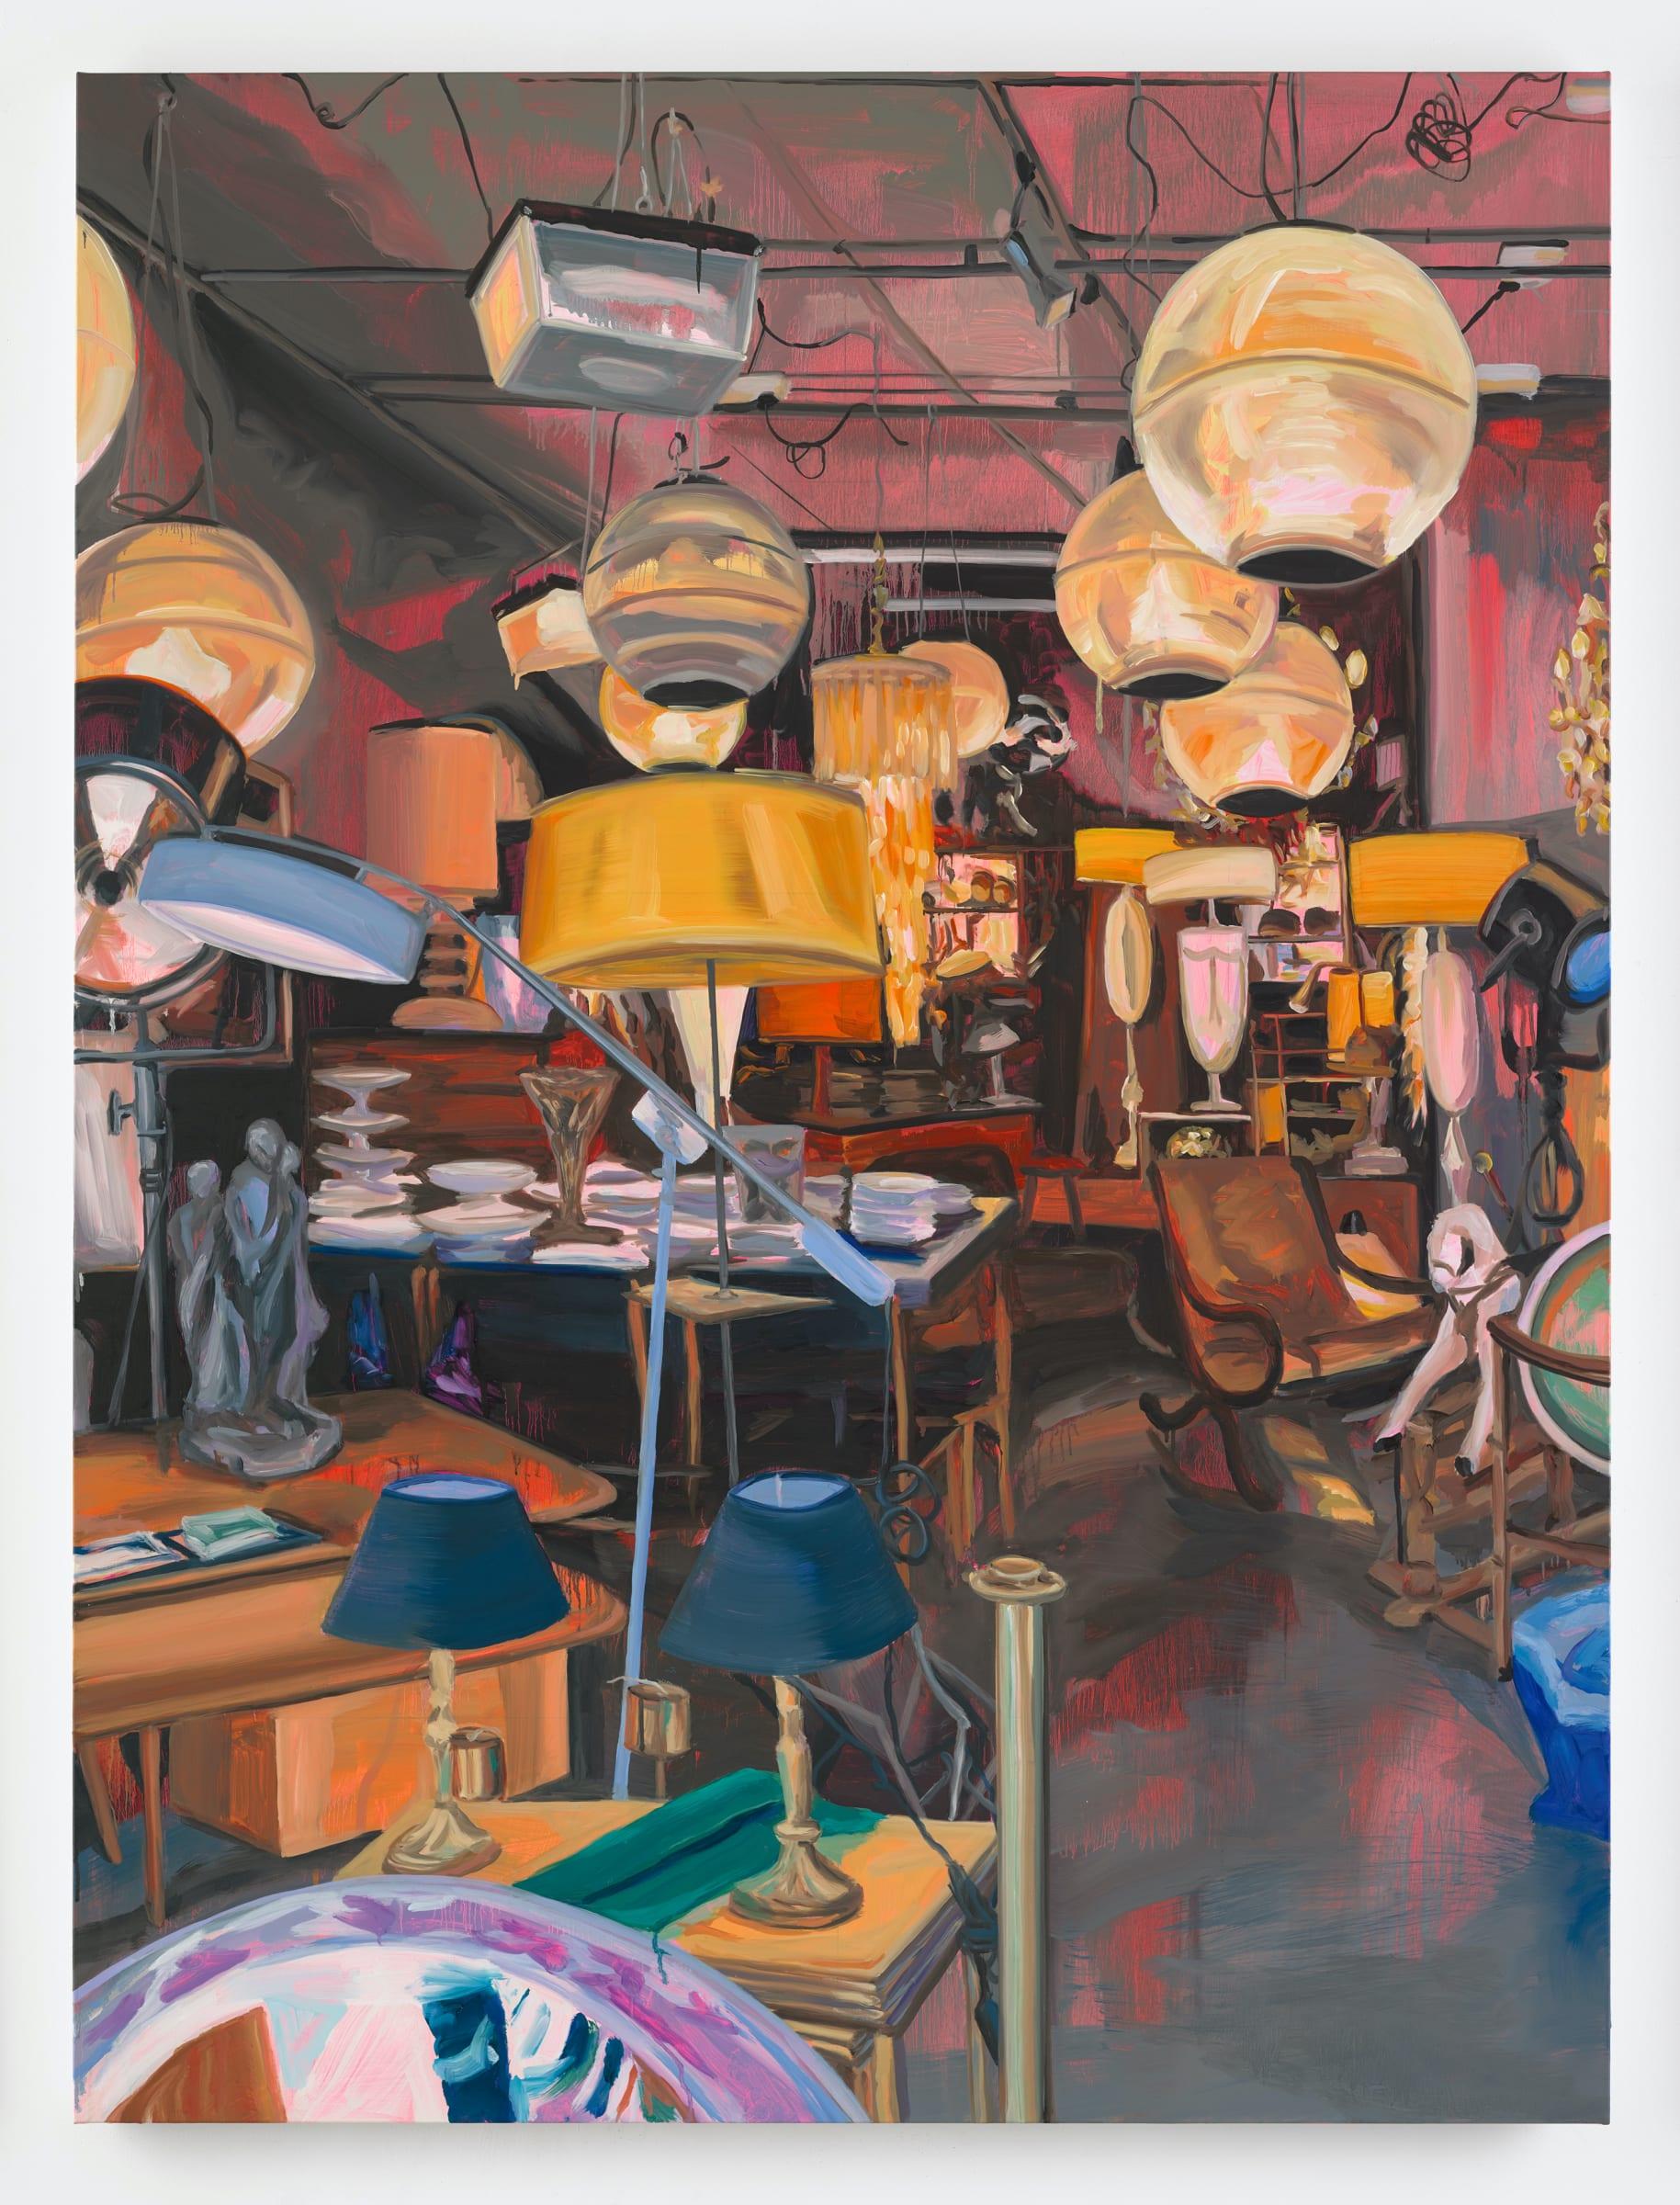 "<span class=""link fancybox-details-link""><a href=""/exhibitions/33/works/artworks1579/"">View Detail Page</a></span><div class=""artist""><strong>Anna Freeman Bentley</strong></div><div class=""title""><em>Illuminating</em>, 2020</div><div class=""medium"">Oil on canvas</div><div class=""dimensions"">180 x 135cm</div>"